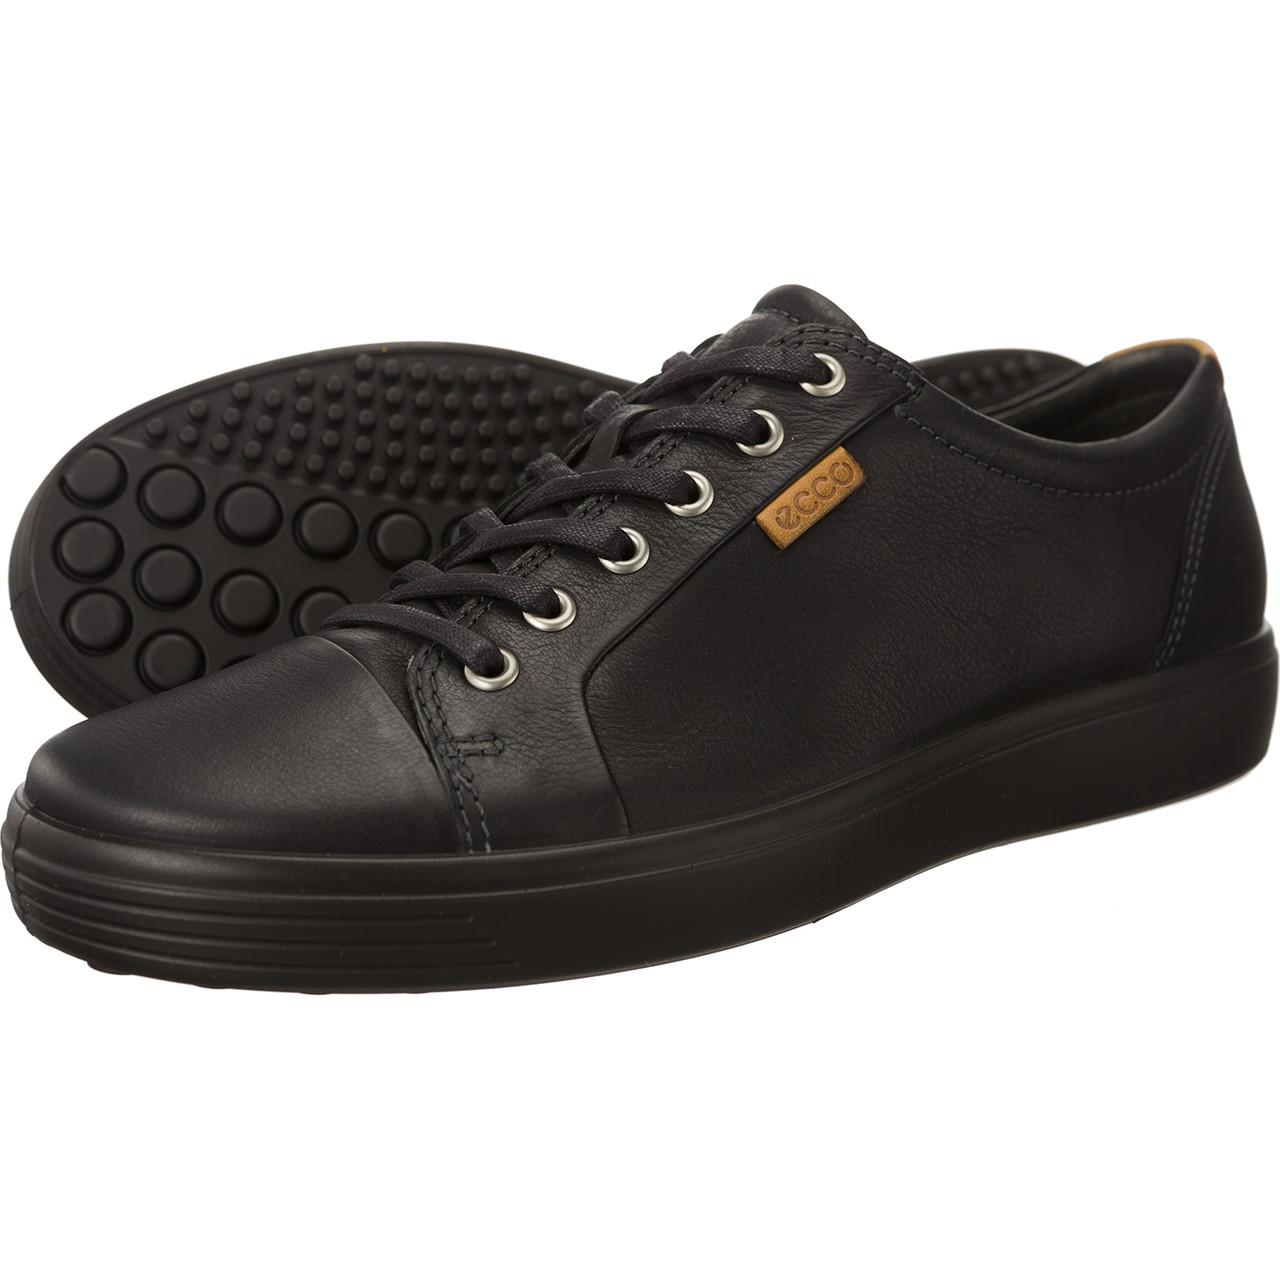 5fadd3ac63 ecco soft 7 mens black for sale > OFF41% Discounts